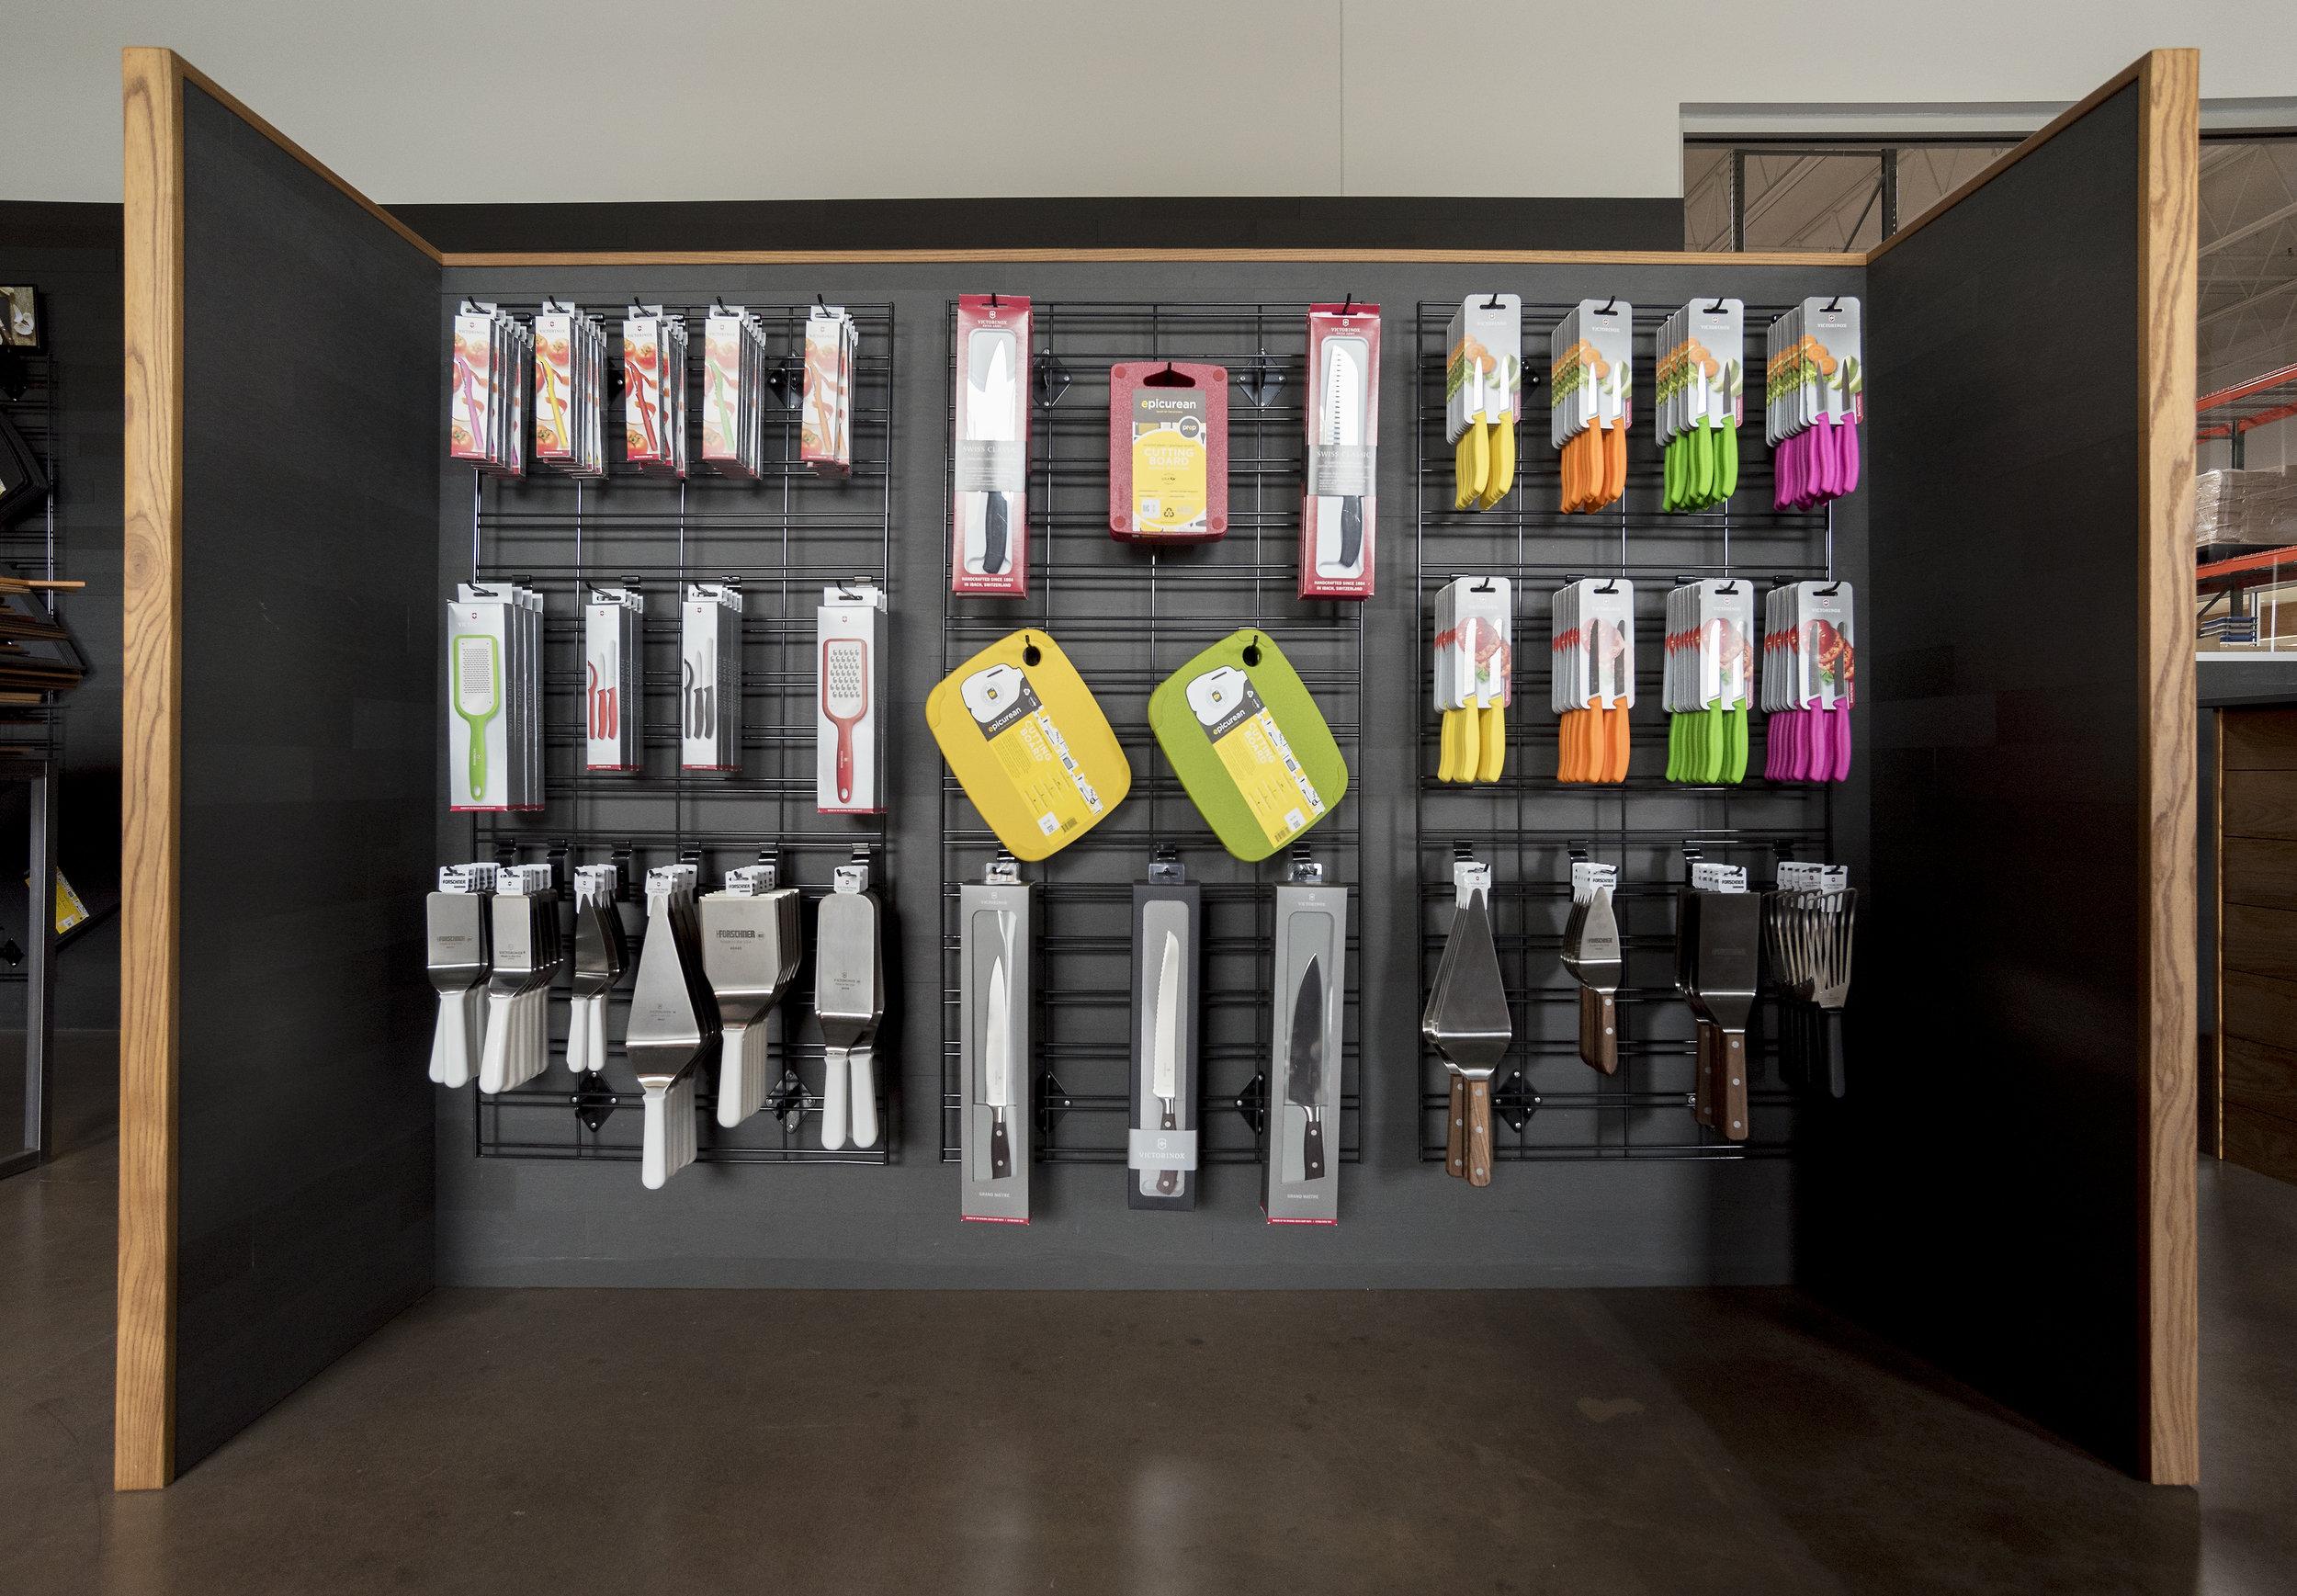 vic kitchen tools (1).jpg